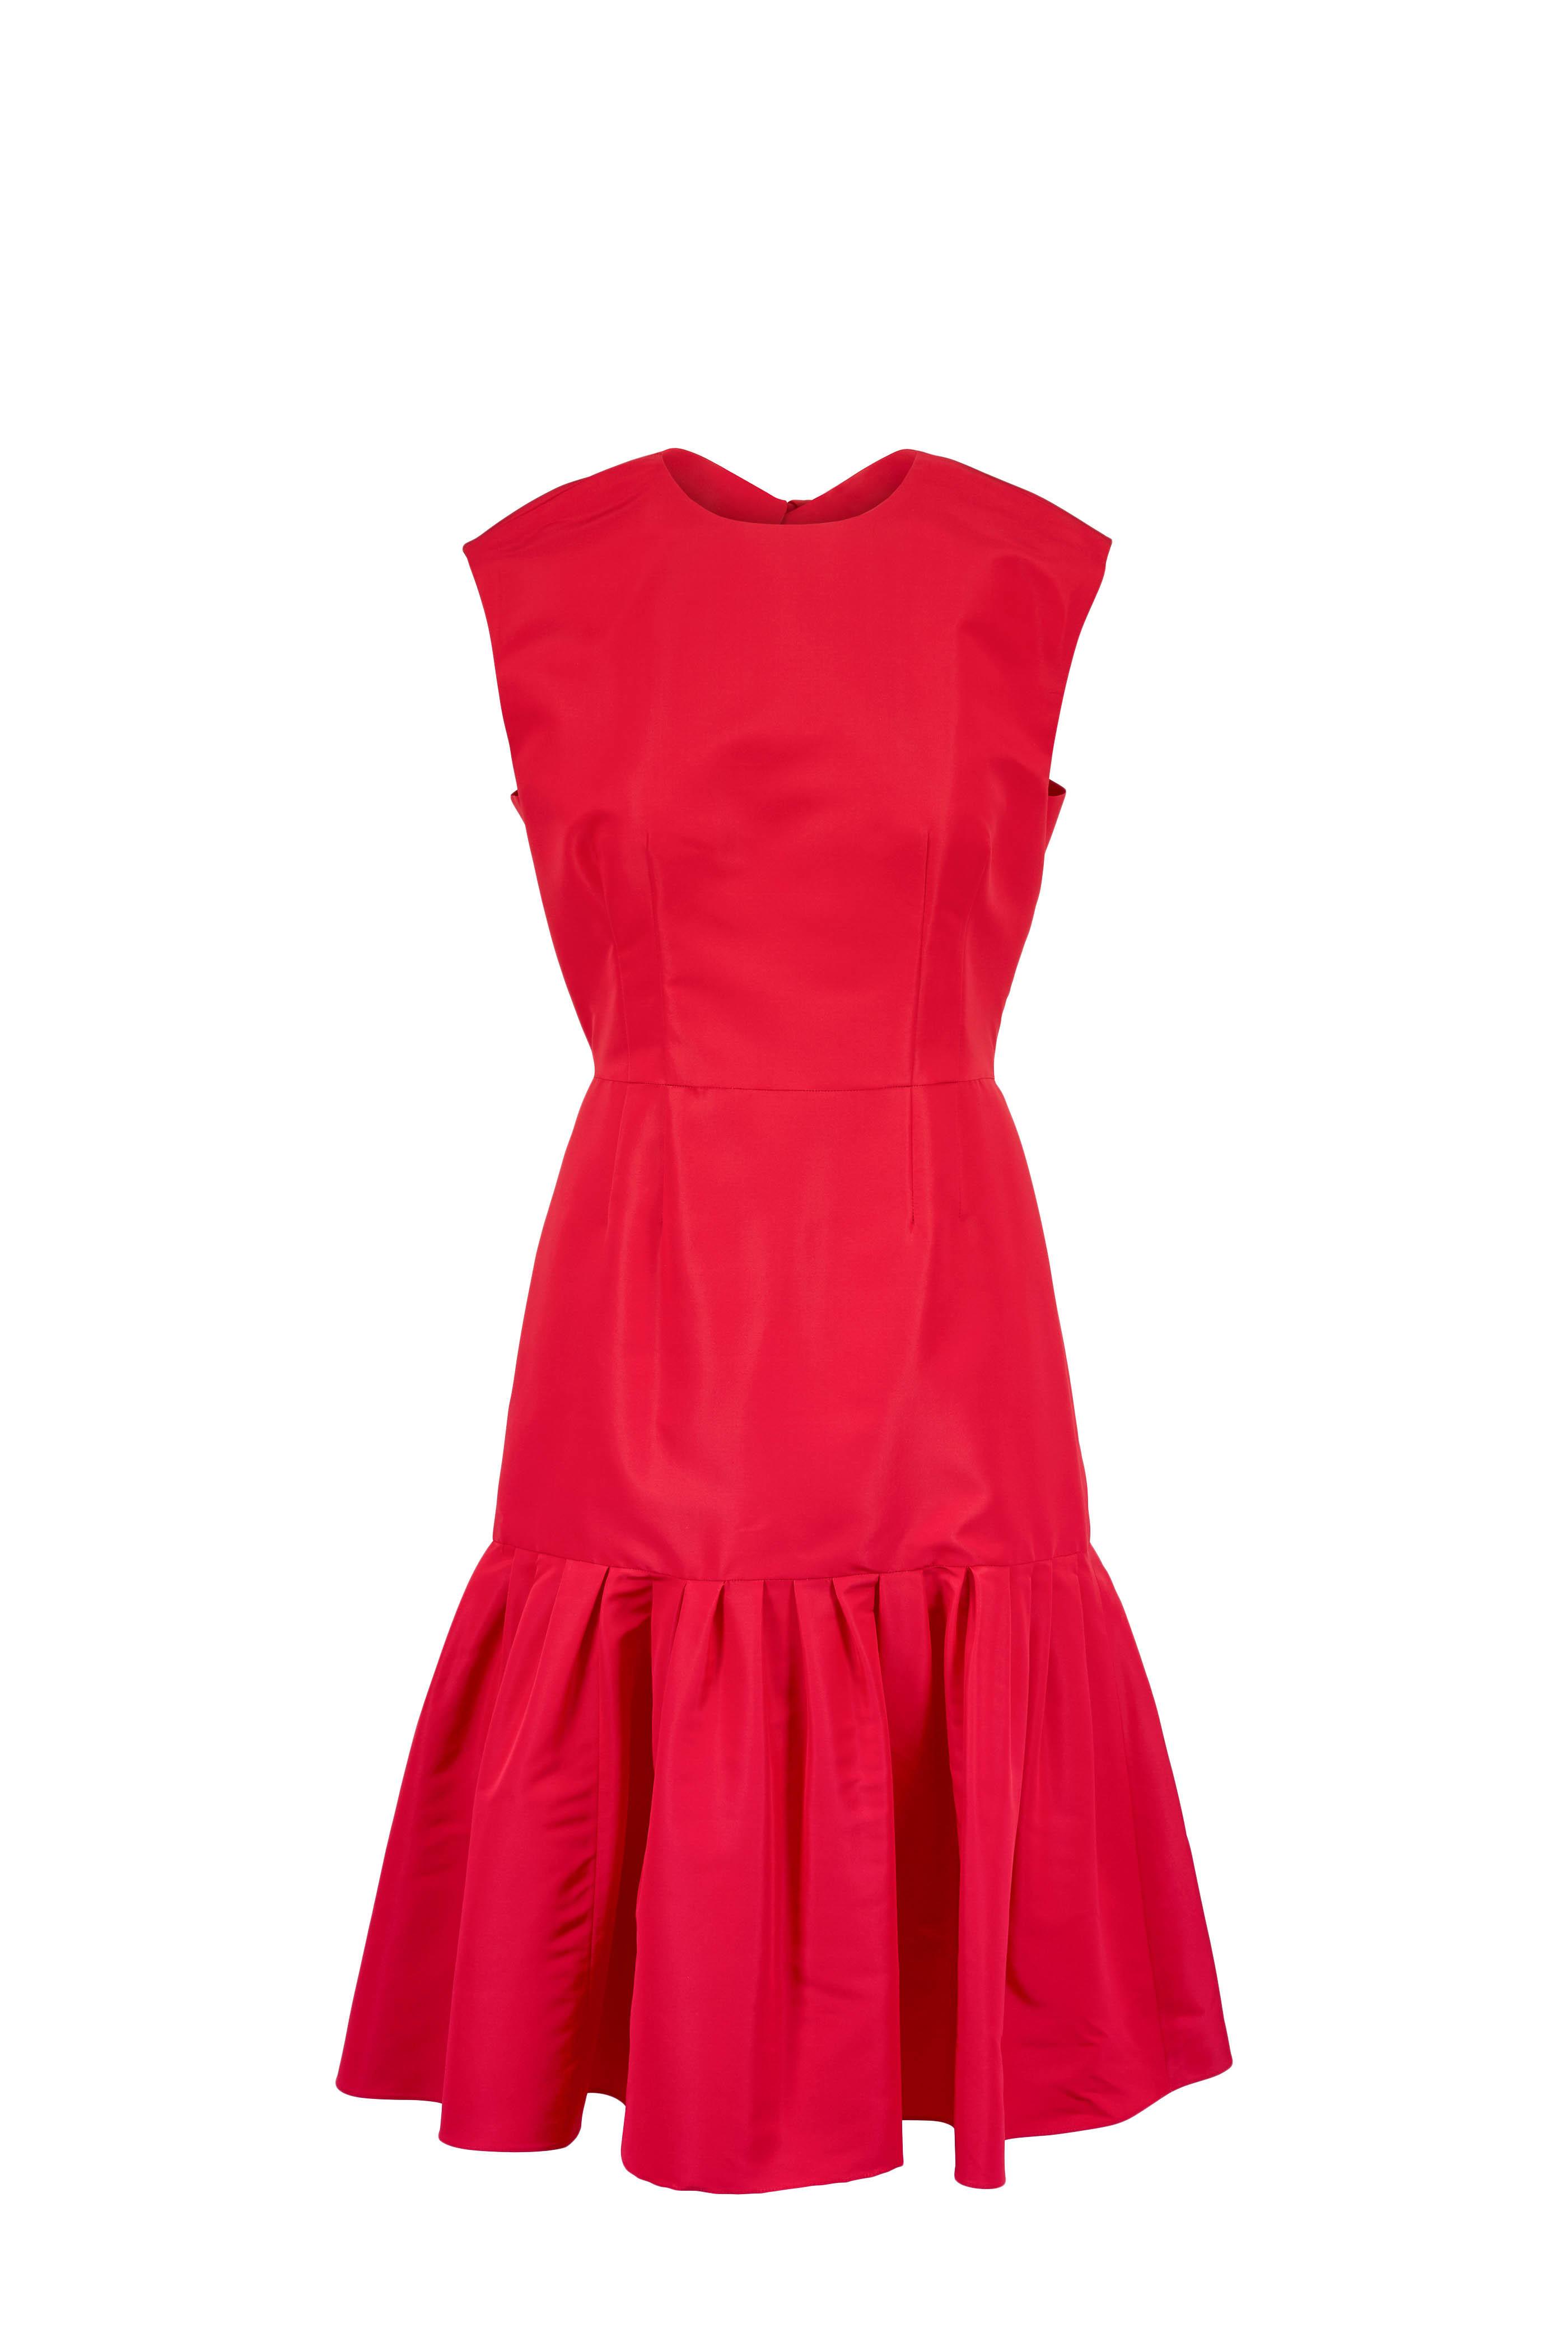 a6621ac43f046 Carolina Herrera - Caro Red Silk Keyhole Cap Sleeve Dress   Mitchell ...